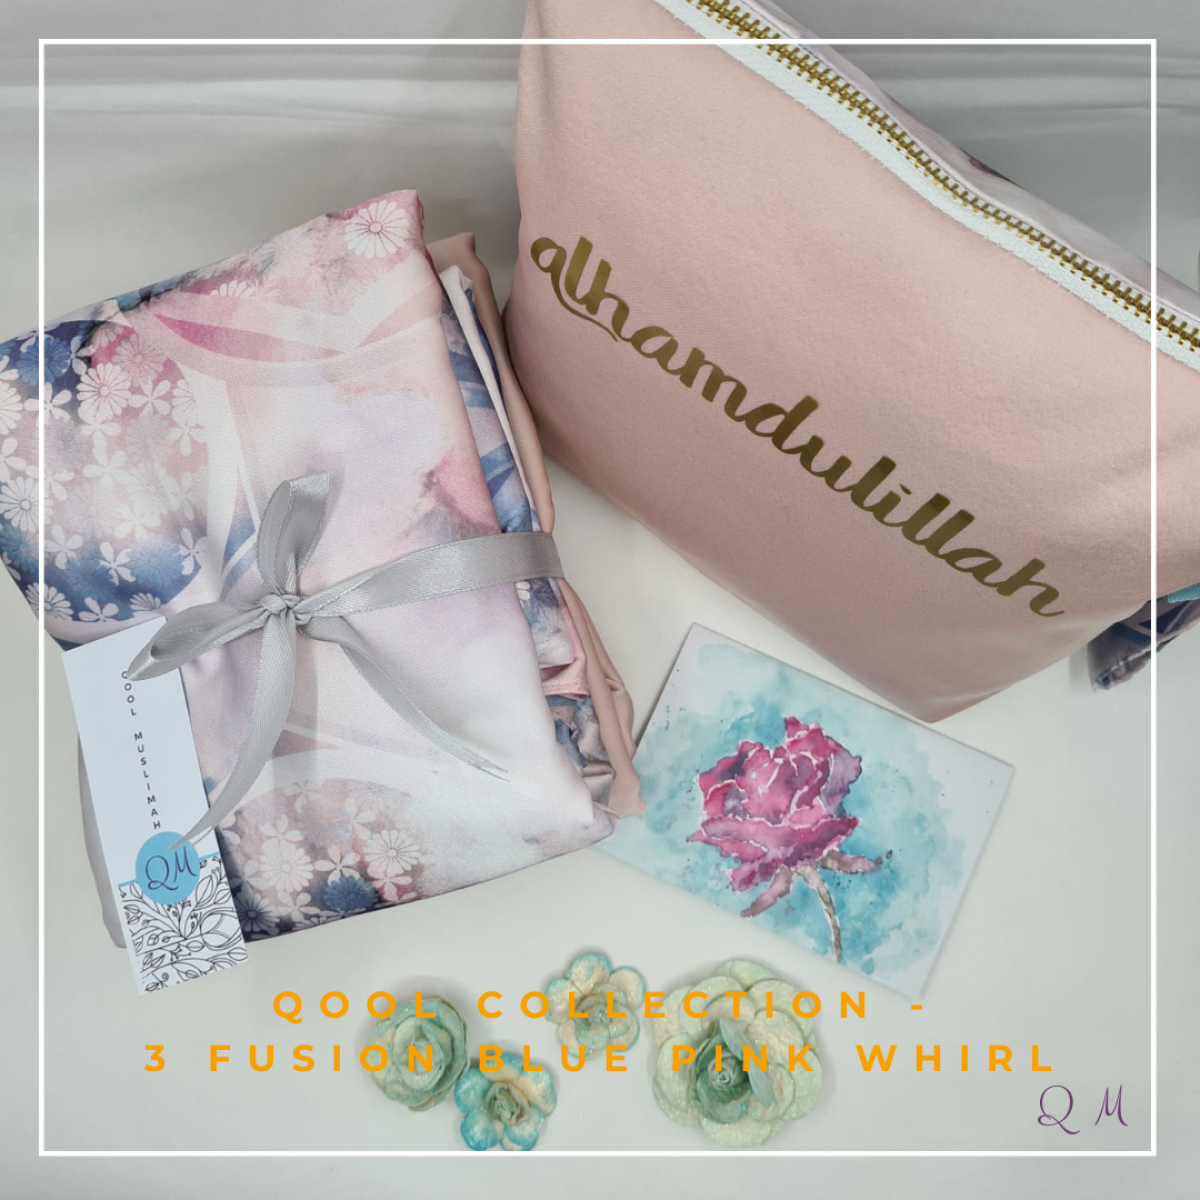 Telekung/Mukena Armani Silk - Fusion Blue Pink Whirl - Qool Muslimah